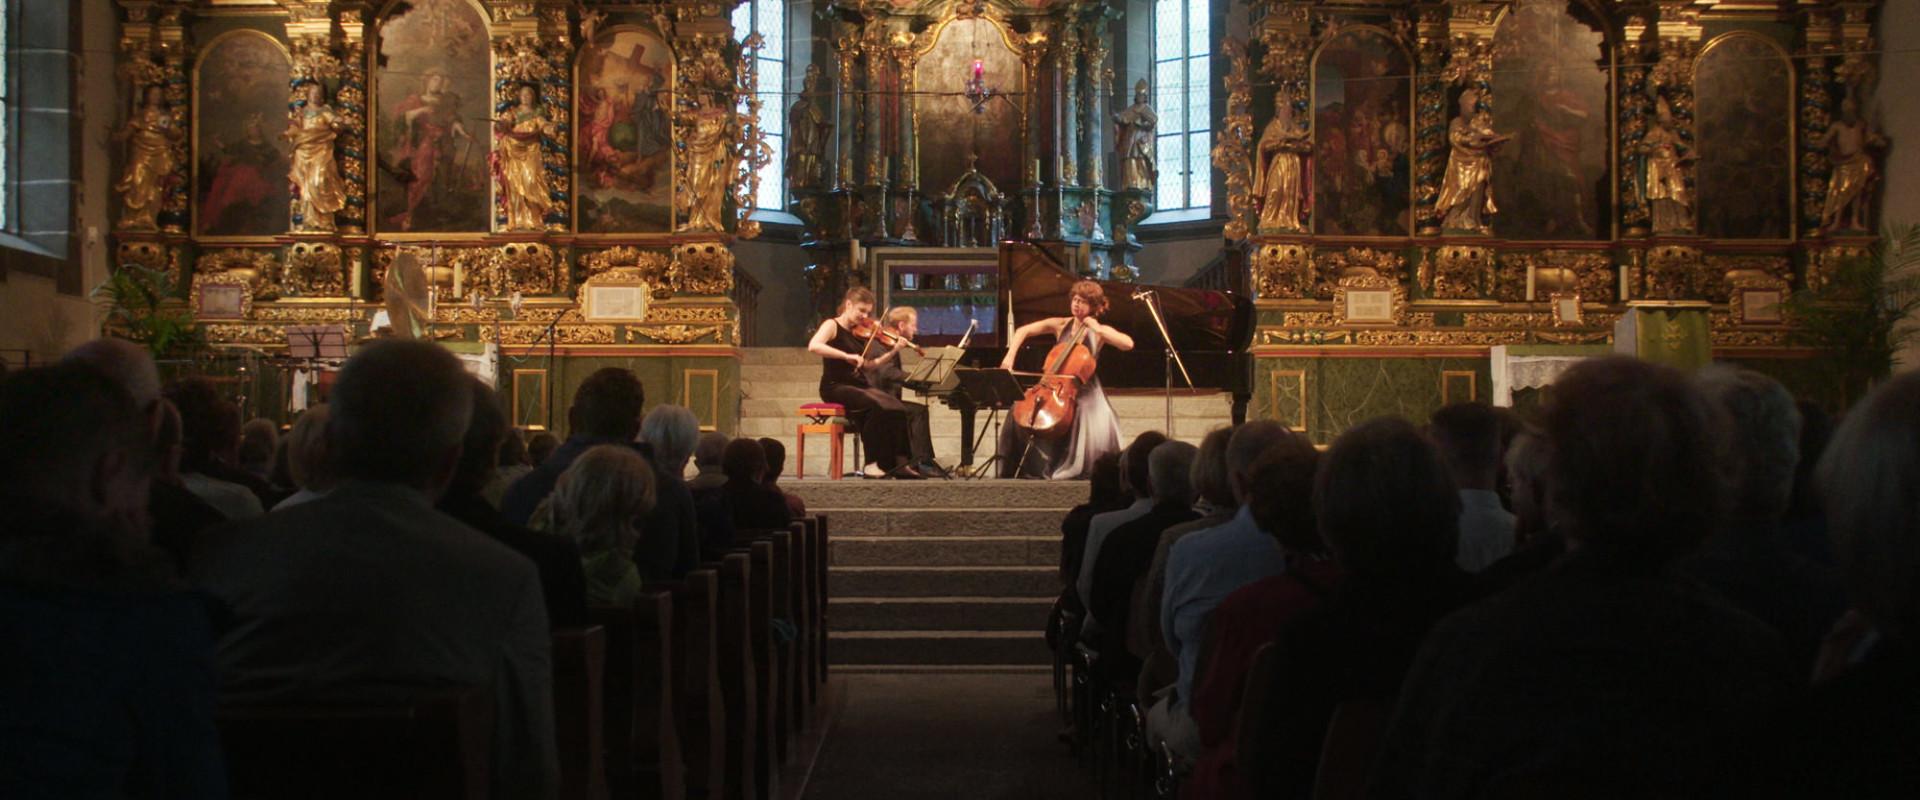 SCHMUTZ Musikdorf Ernen – Independent Klassikfestival | Trailer 2018